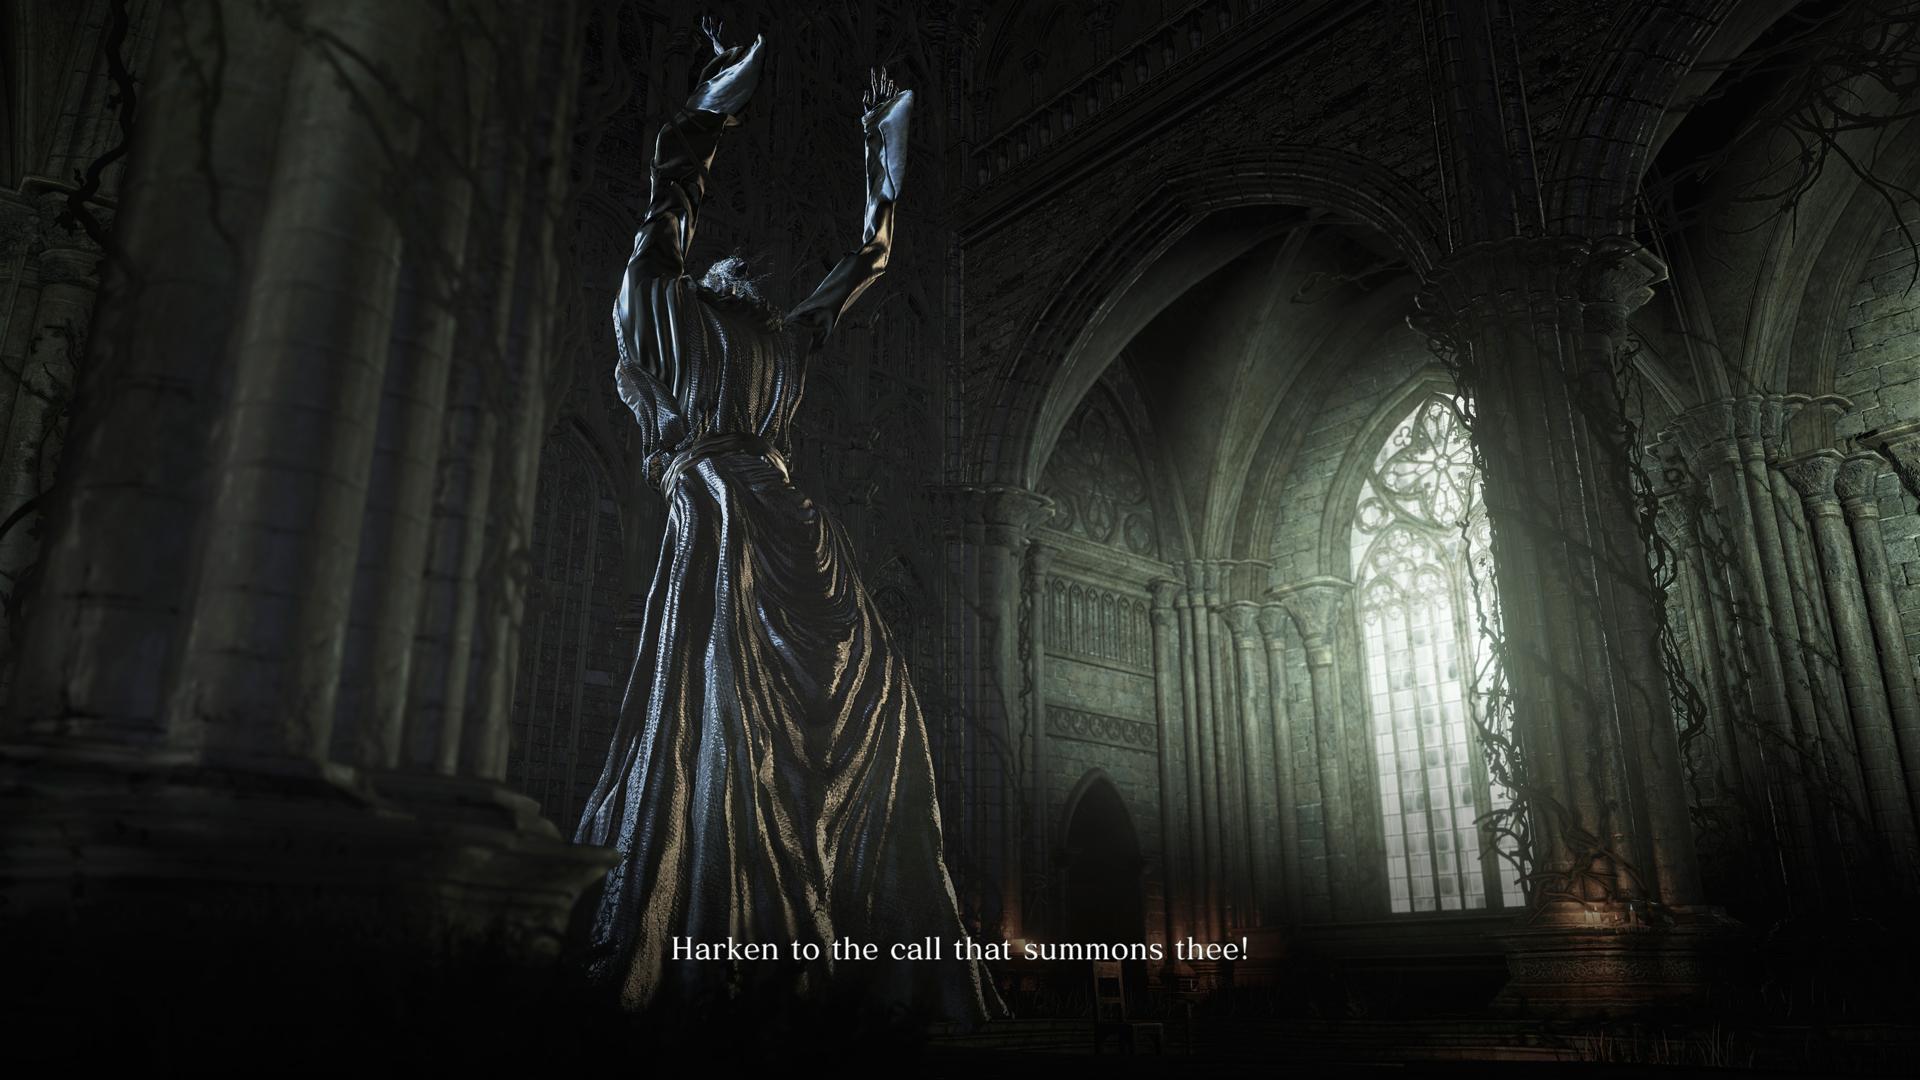 Mar 24, 2017 Dark Souls III The Ringed City Launch Trailer